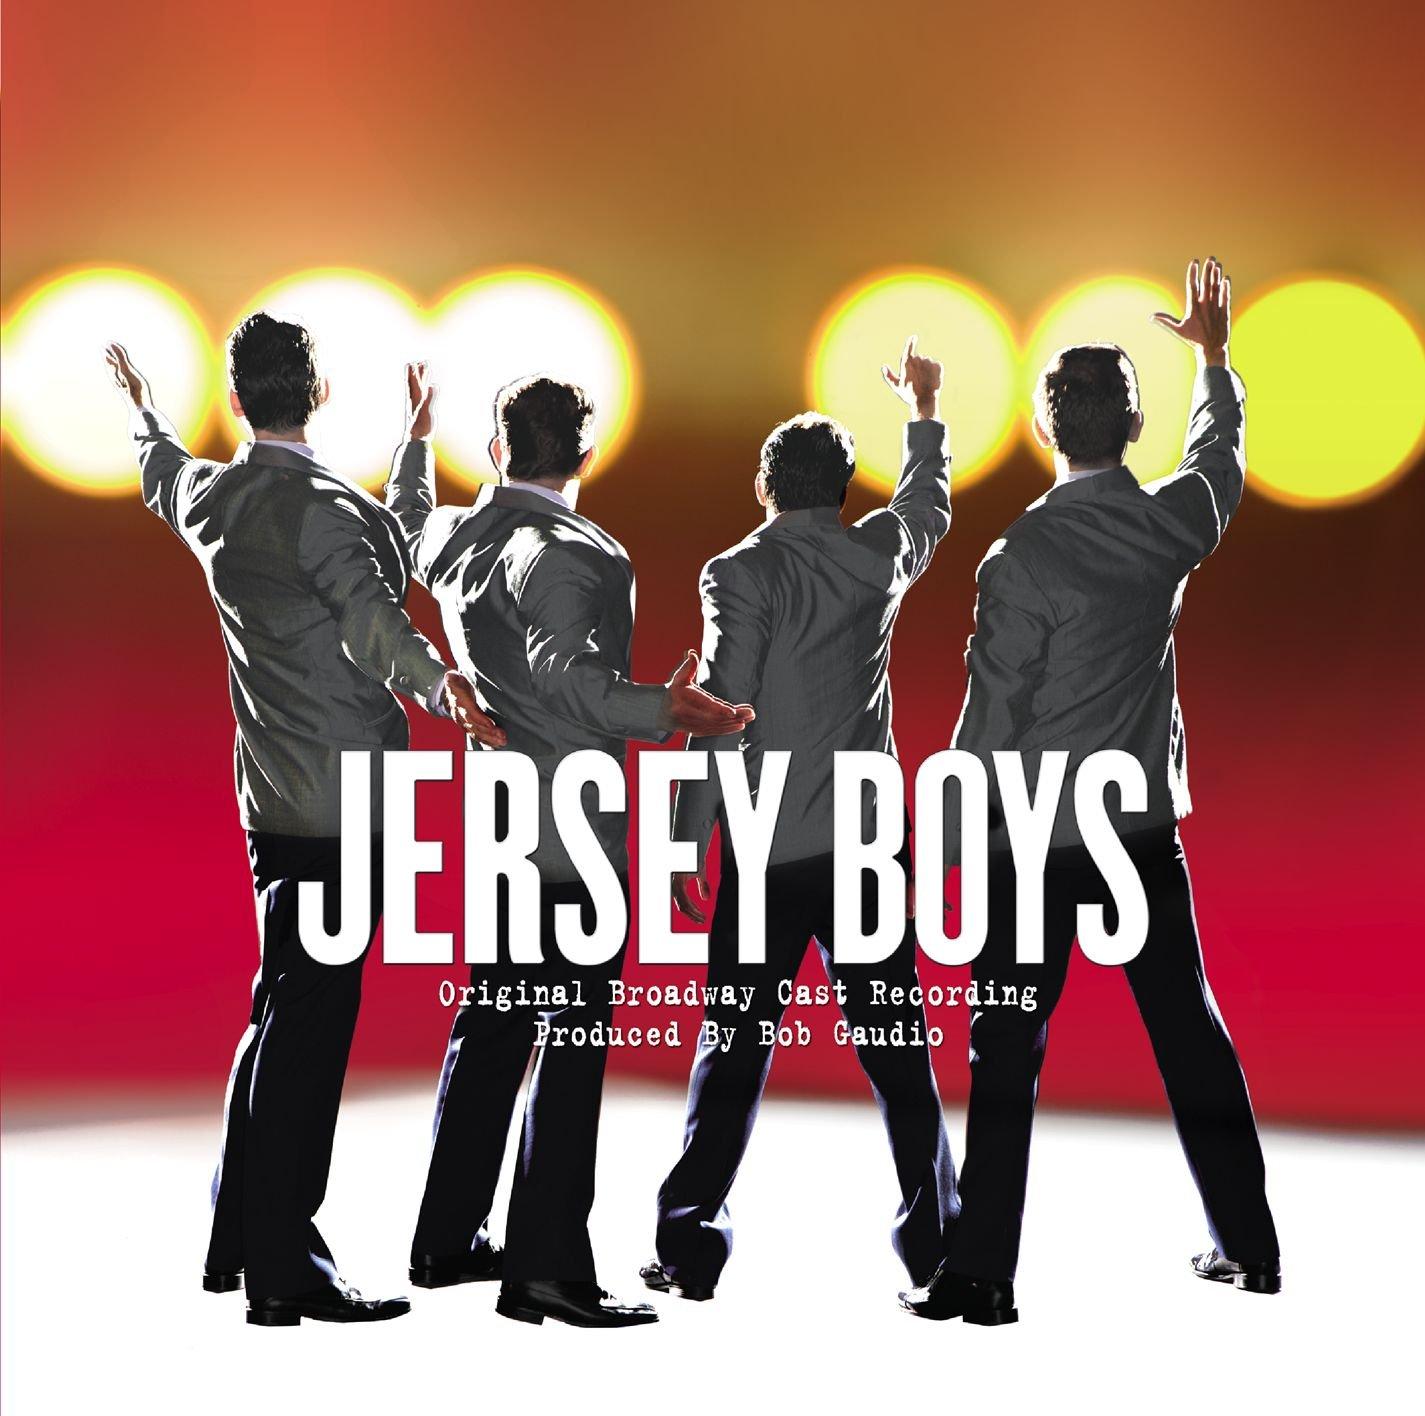 jersey boys original